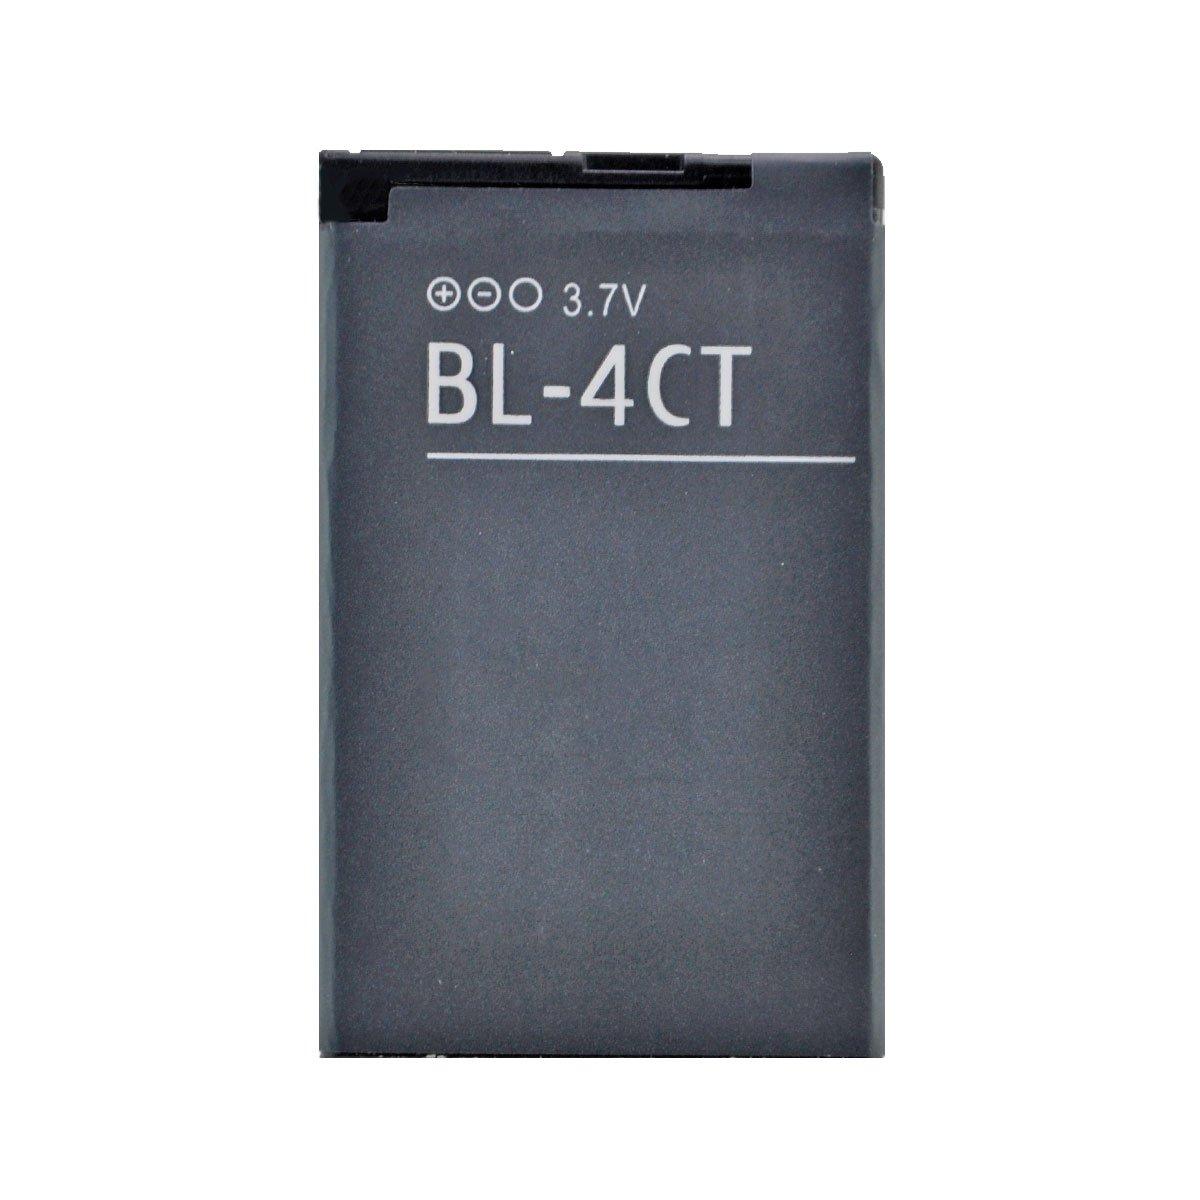 Аккумуляторная батарея для Nokia 7310 BL-4CT